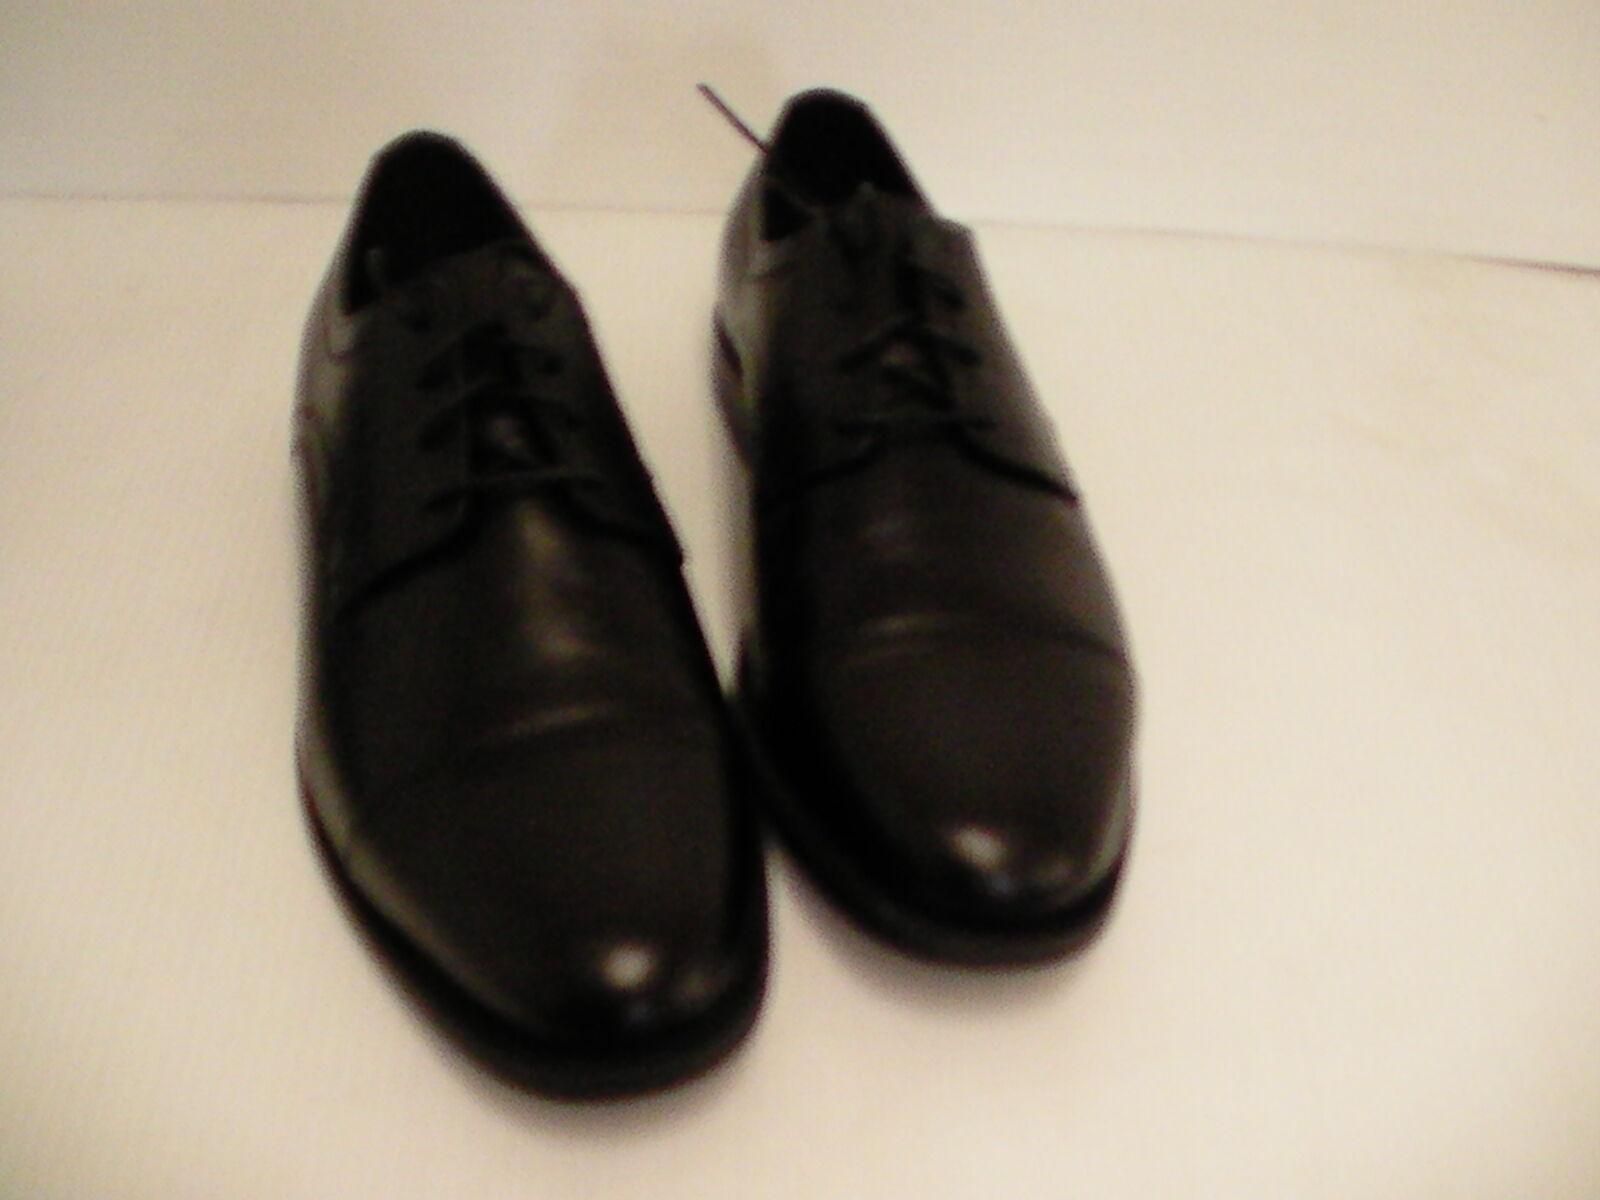 Cole HAAN Umkleide Schuhe Dustin Kappe Oxford II Größe 12 Herren Us